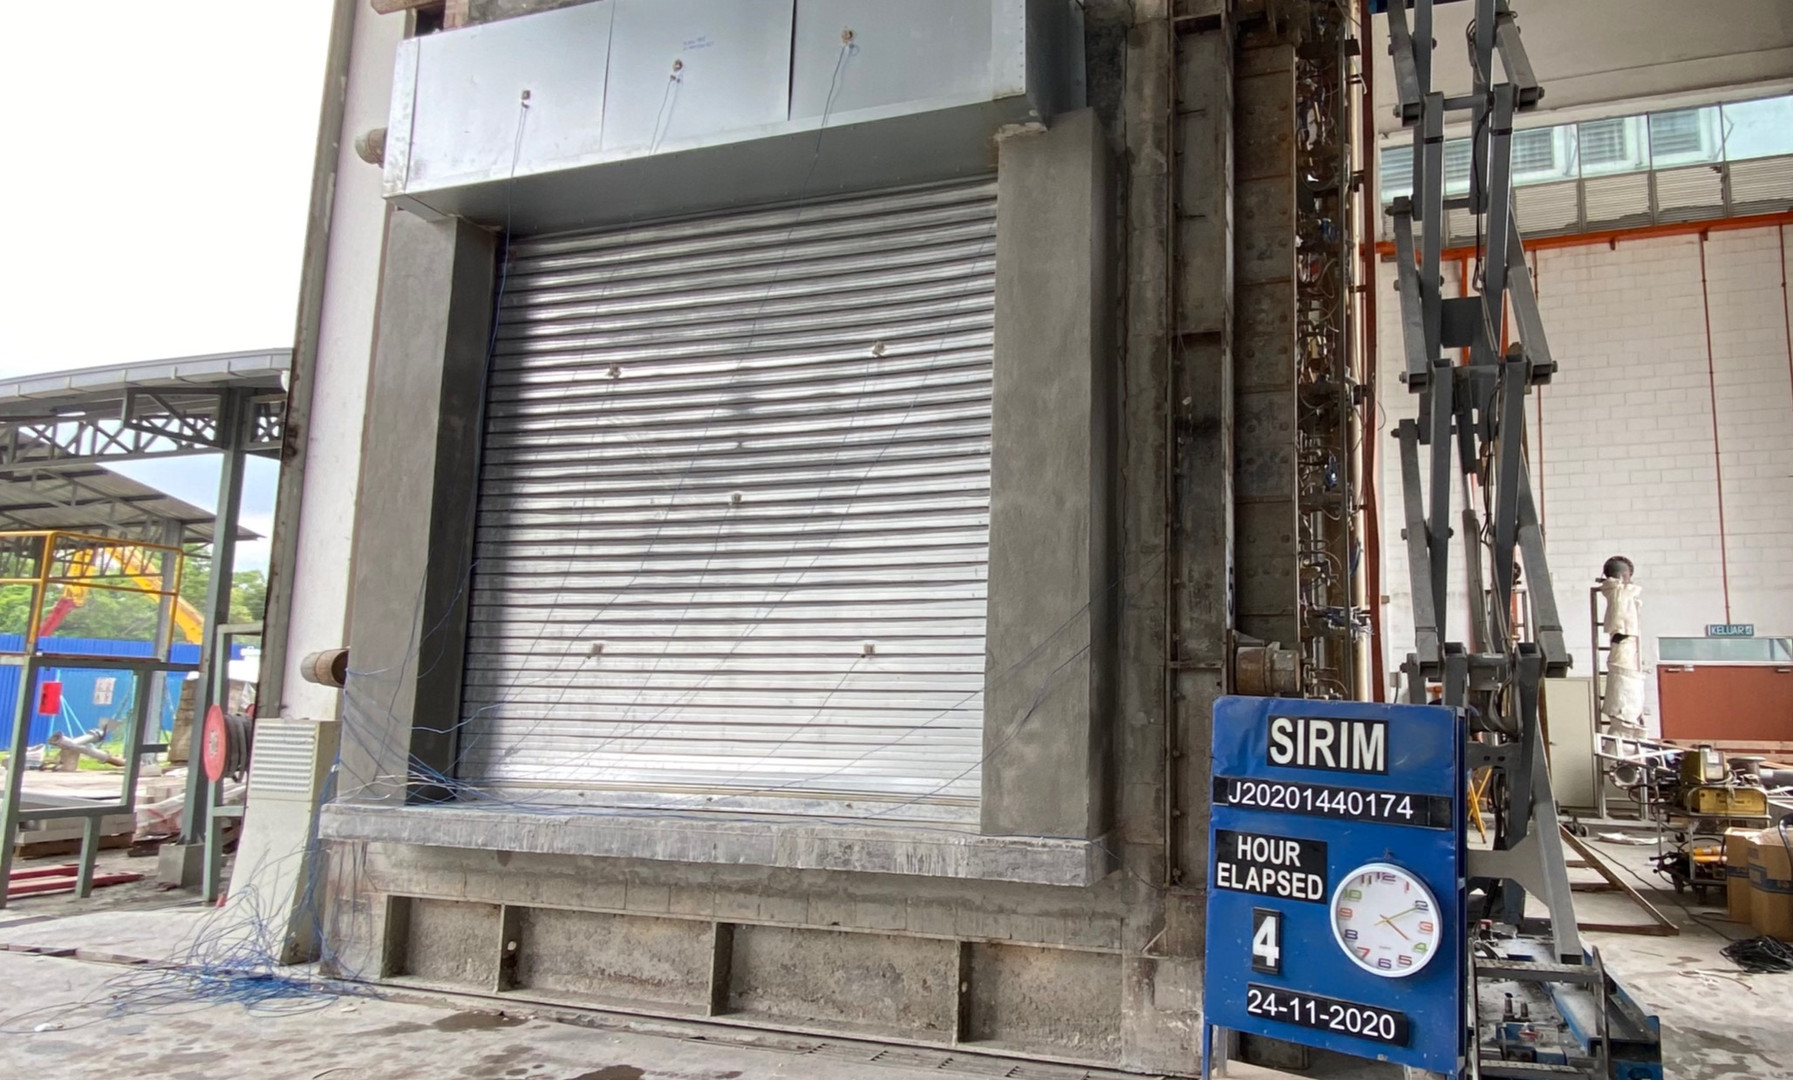 Malaysia Insulated Fire Shutter 4 Hours